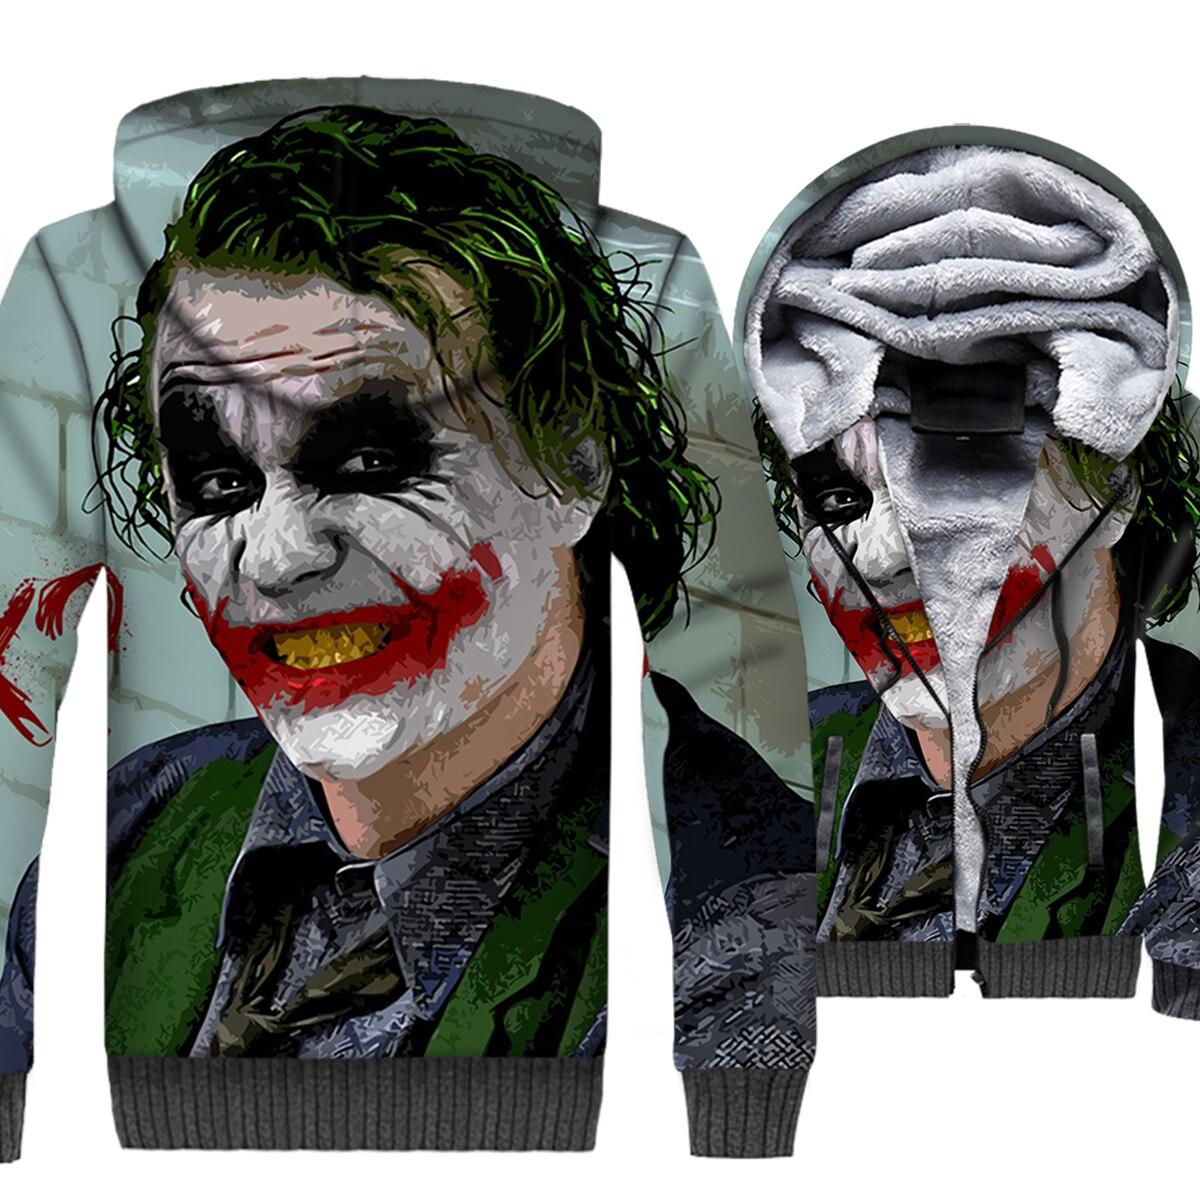 Batman Villains Joker 3D Print Hoodie Men Hip Hop Sweatshirts Who Laughs Coat Winter Thick Fleece Warm Jackets Swag Sportswear